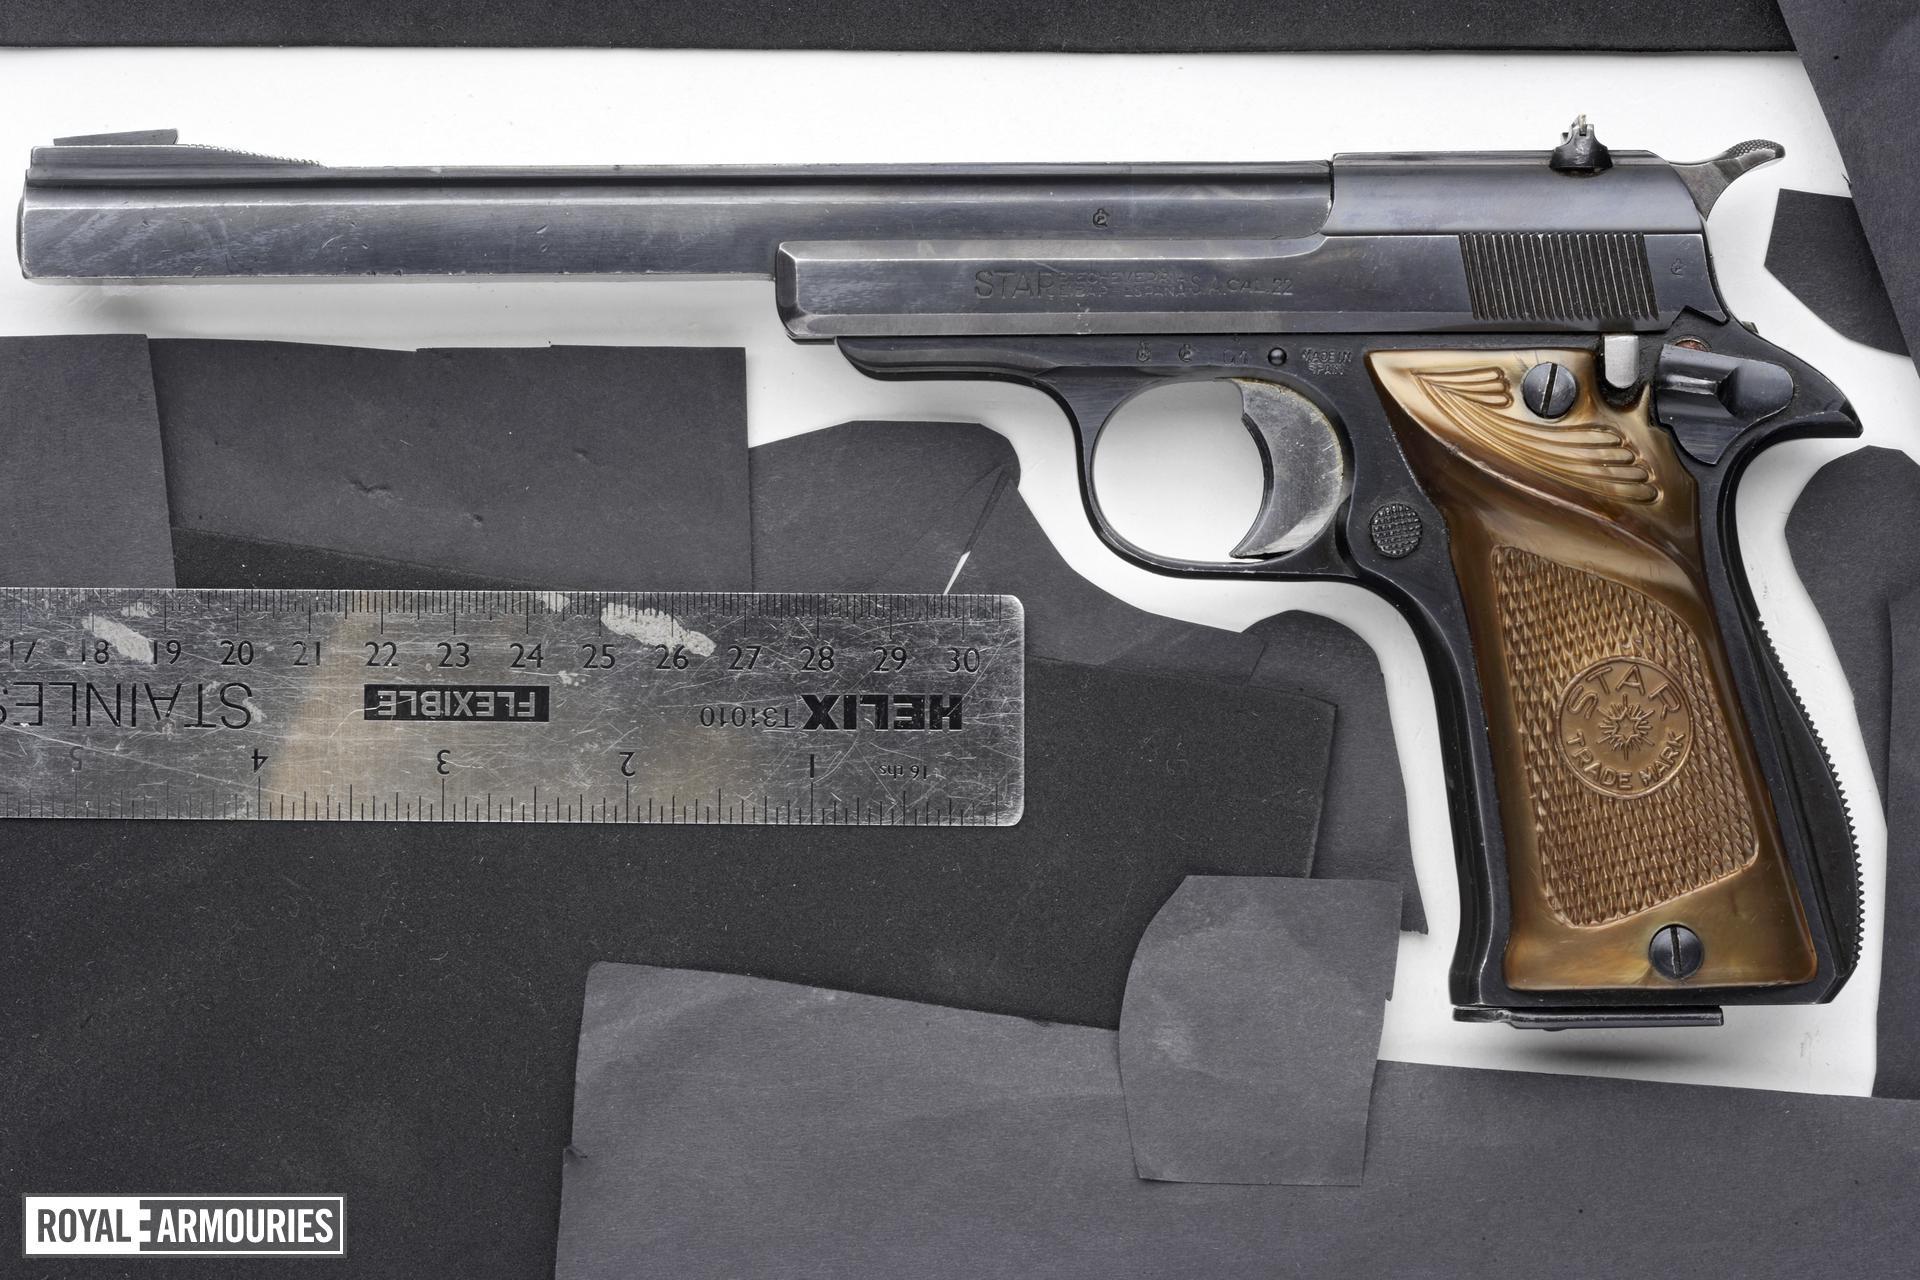 Rimfire self-loading target pistol - Star Model F